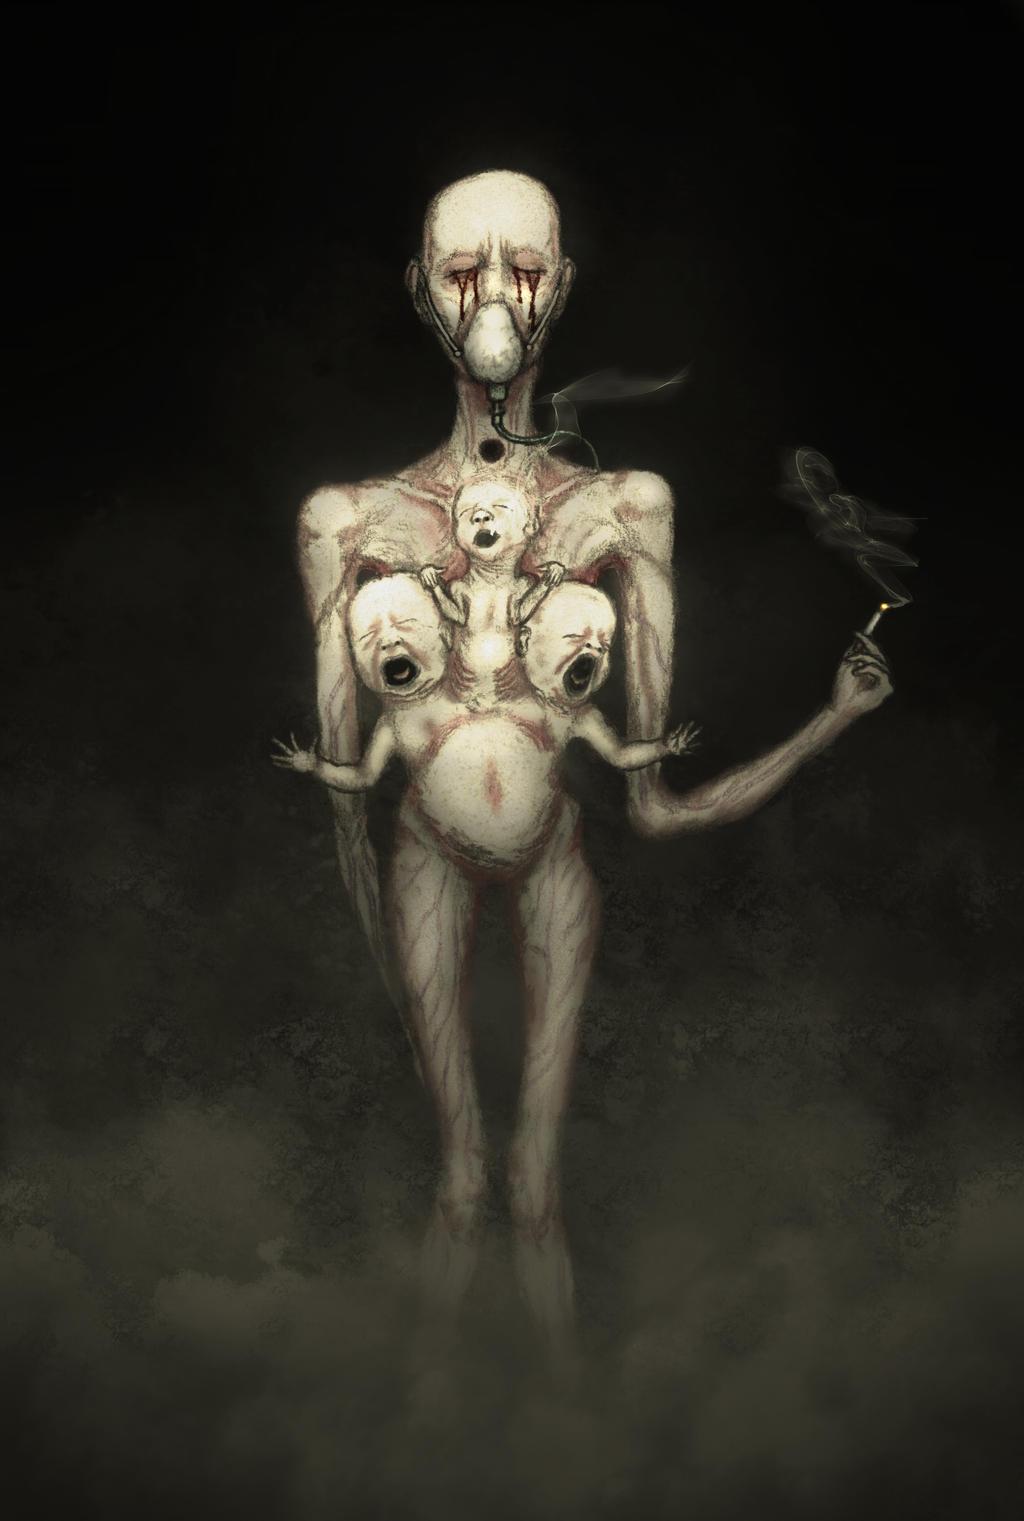 Slave of the Toxic Addiction by Pyramiddhead